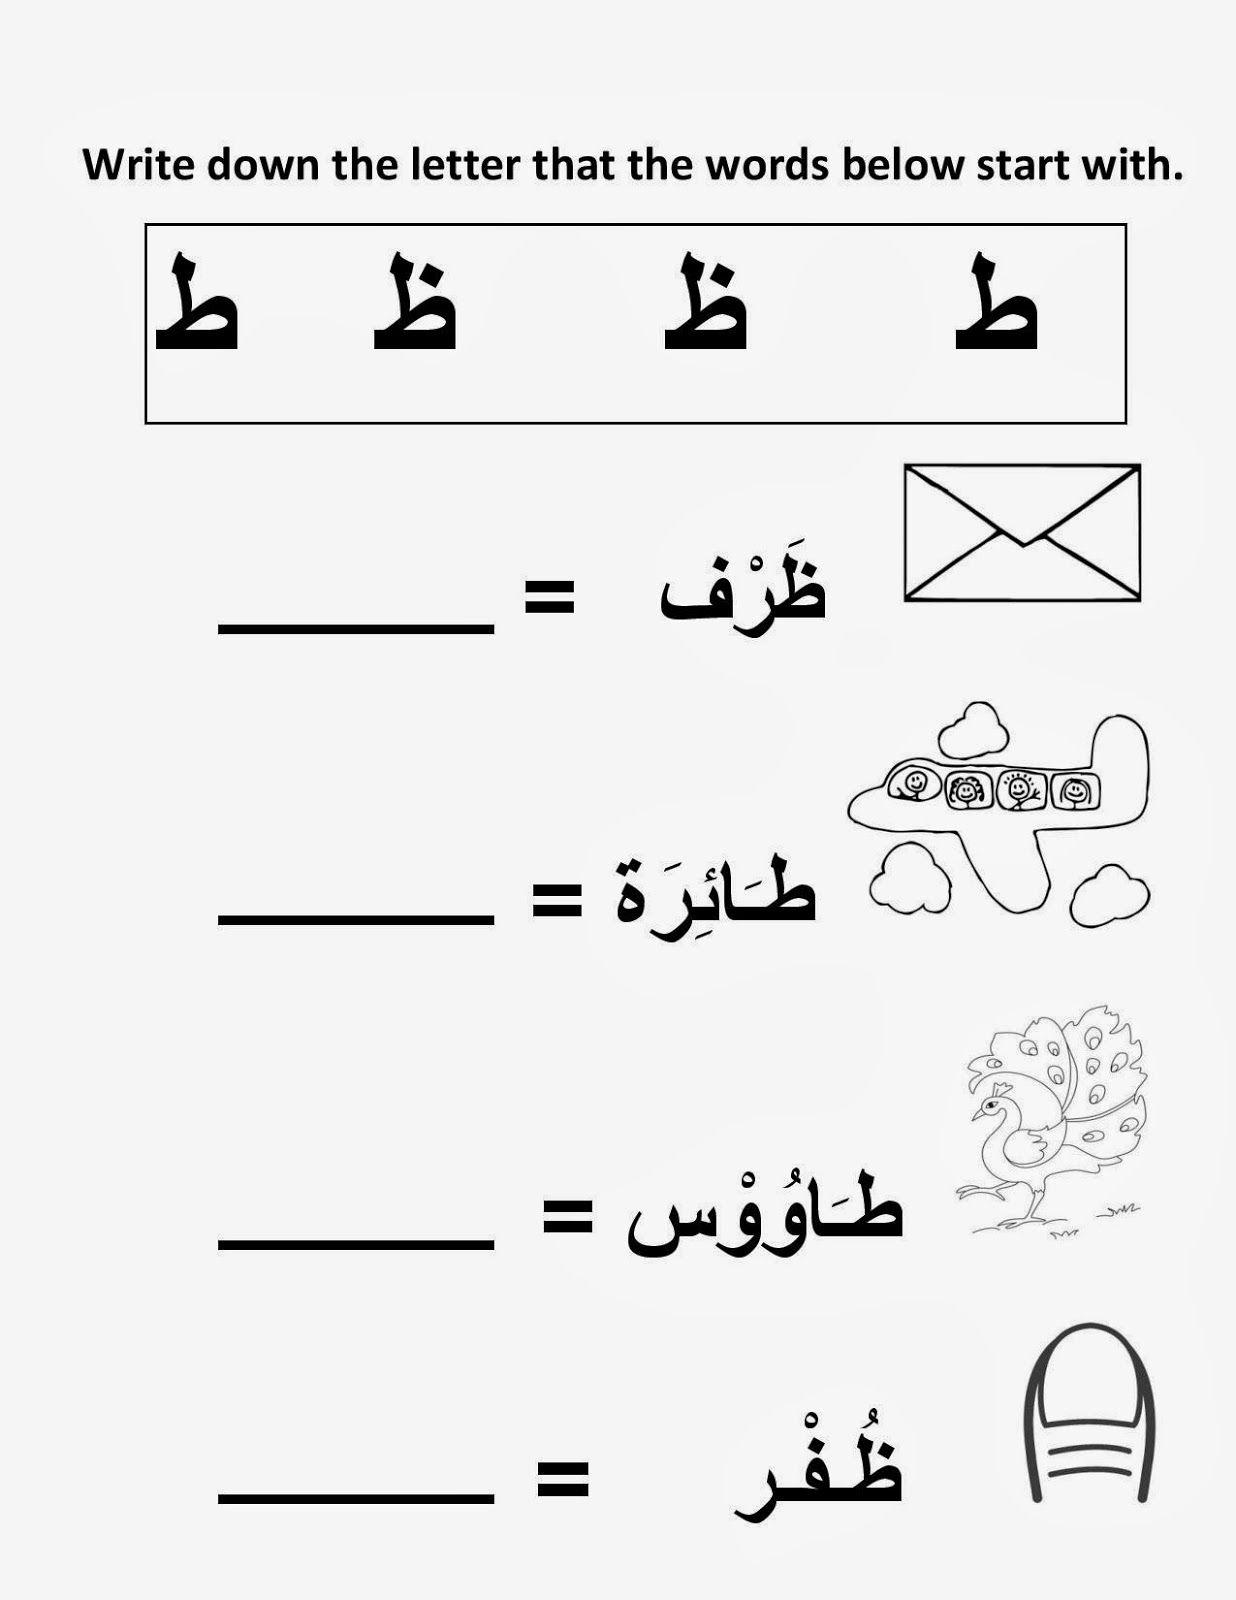 Alif Ba Taa Pre School Jpg 1 236 1 600 Pixels Arabic Alphabet Alphabet Worksheets Letter Worksheets